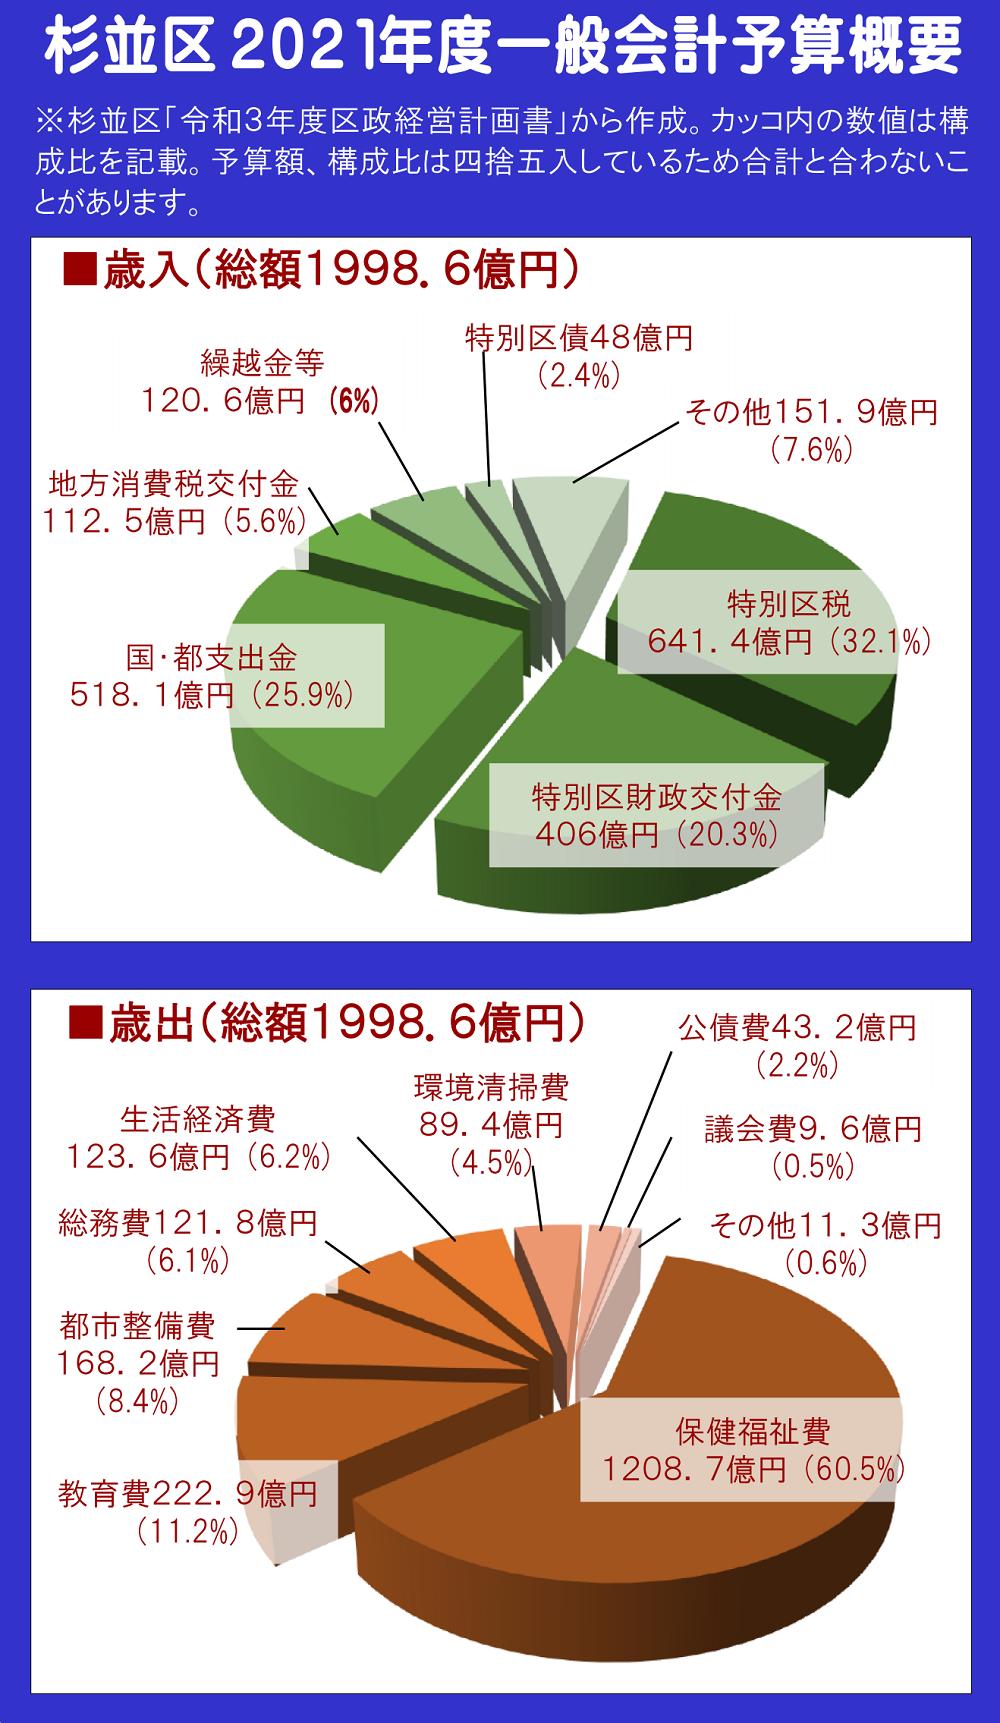 日本共産党_杉並区議会議員_富田たく_区政報告ニュース_211_img002